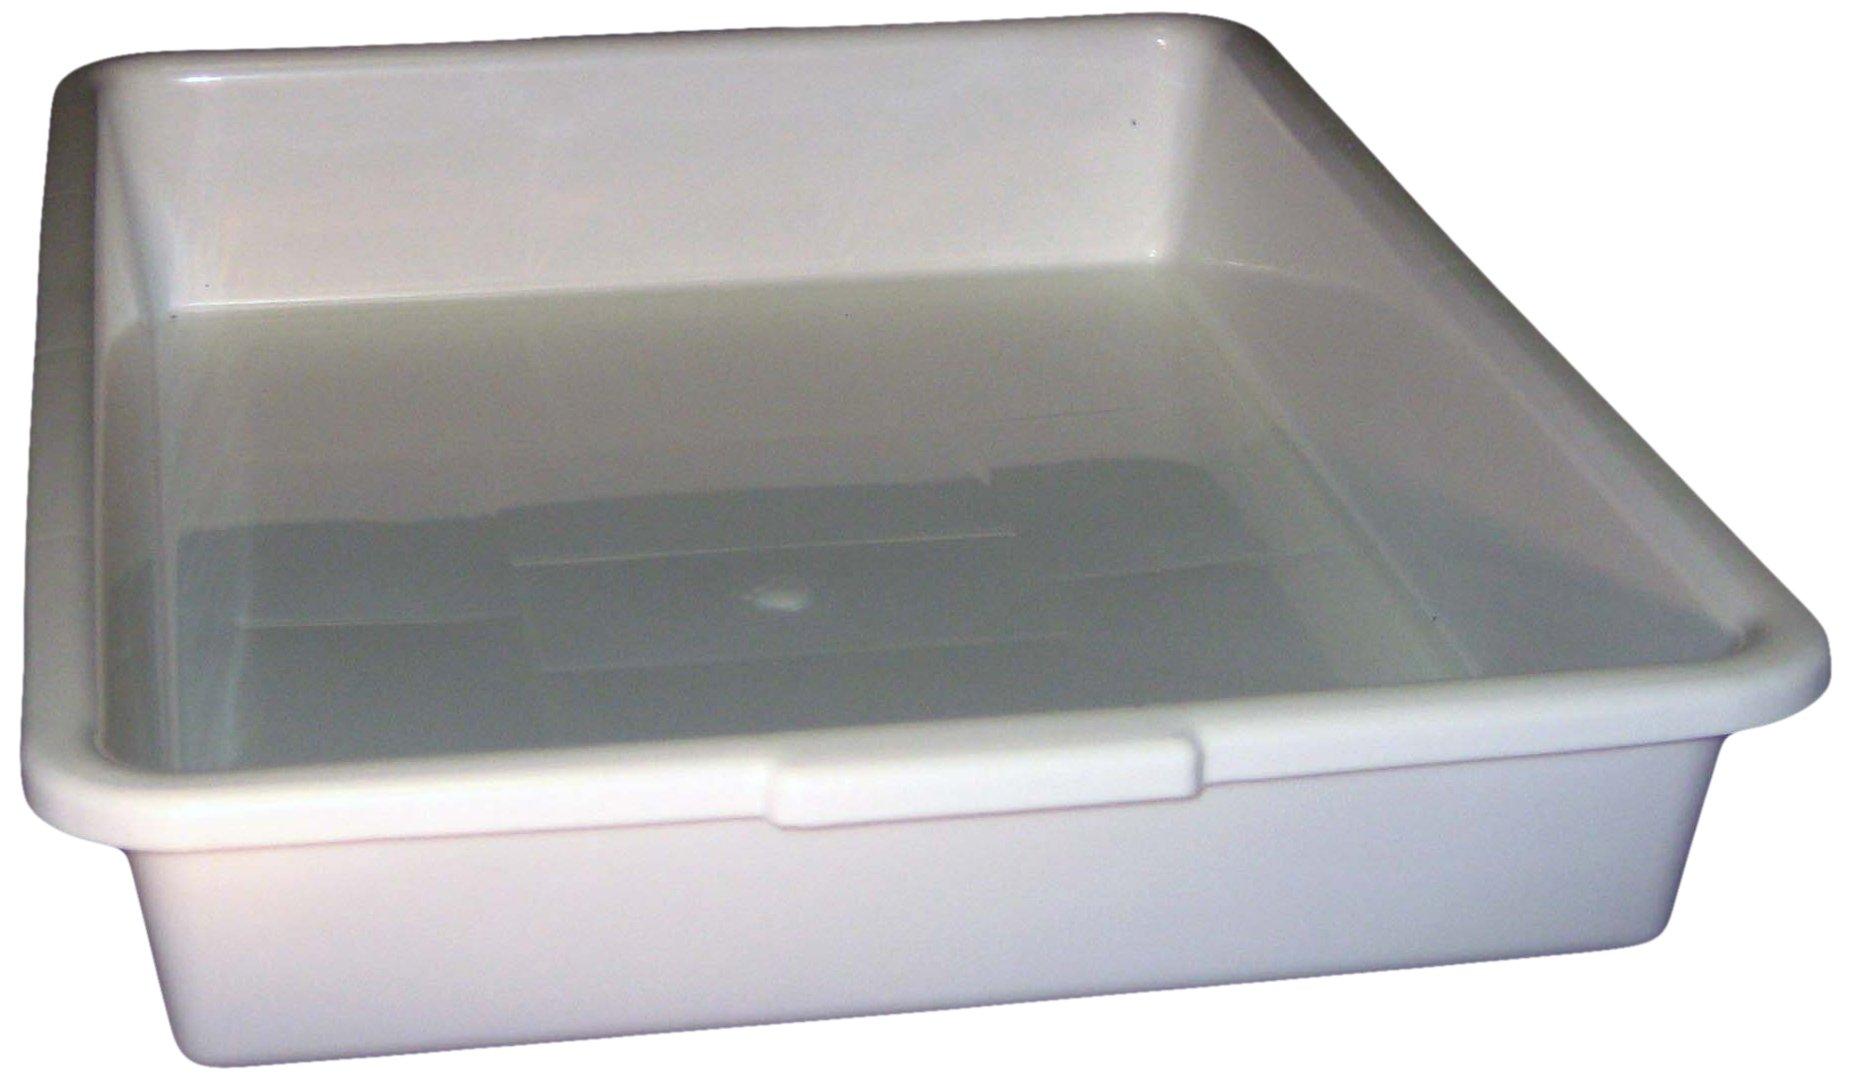 PSC 1007176 General Purpose Tray, Autoclavable, Polypropylene, 18'' x 14'' x 3'', White